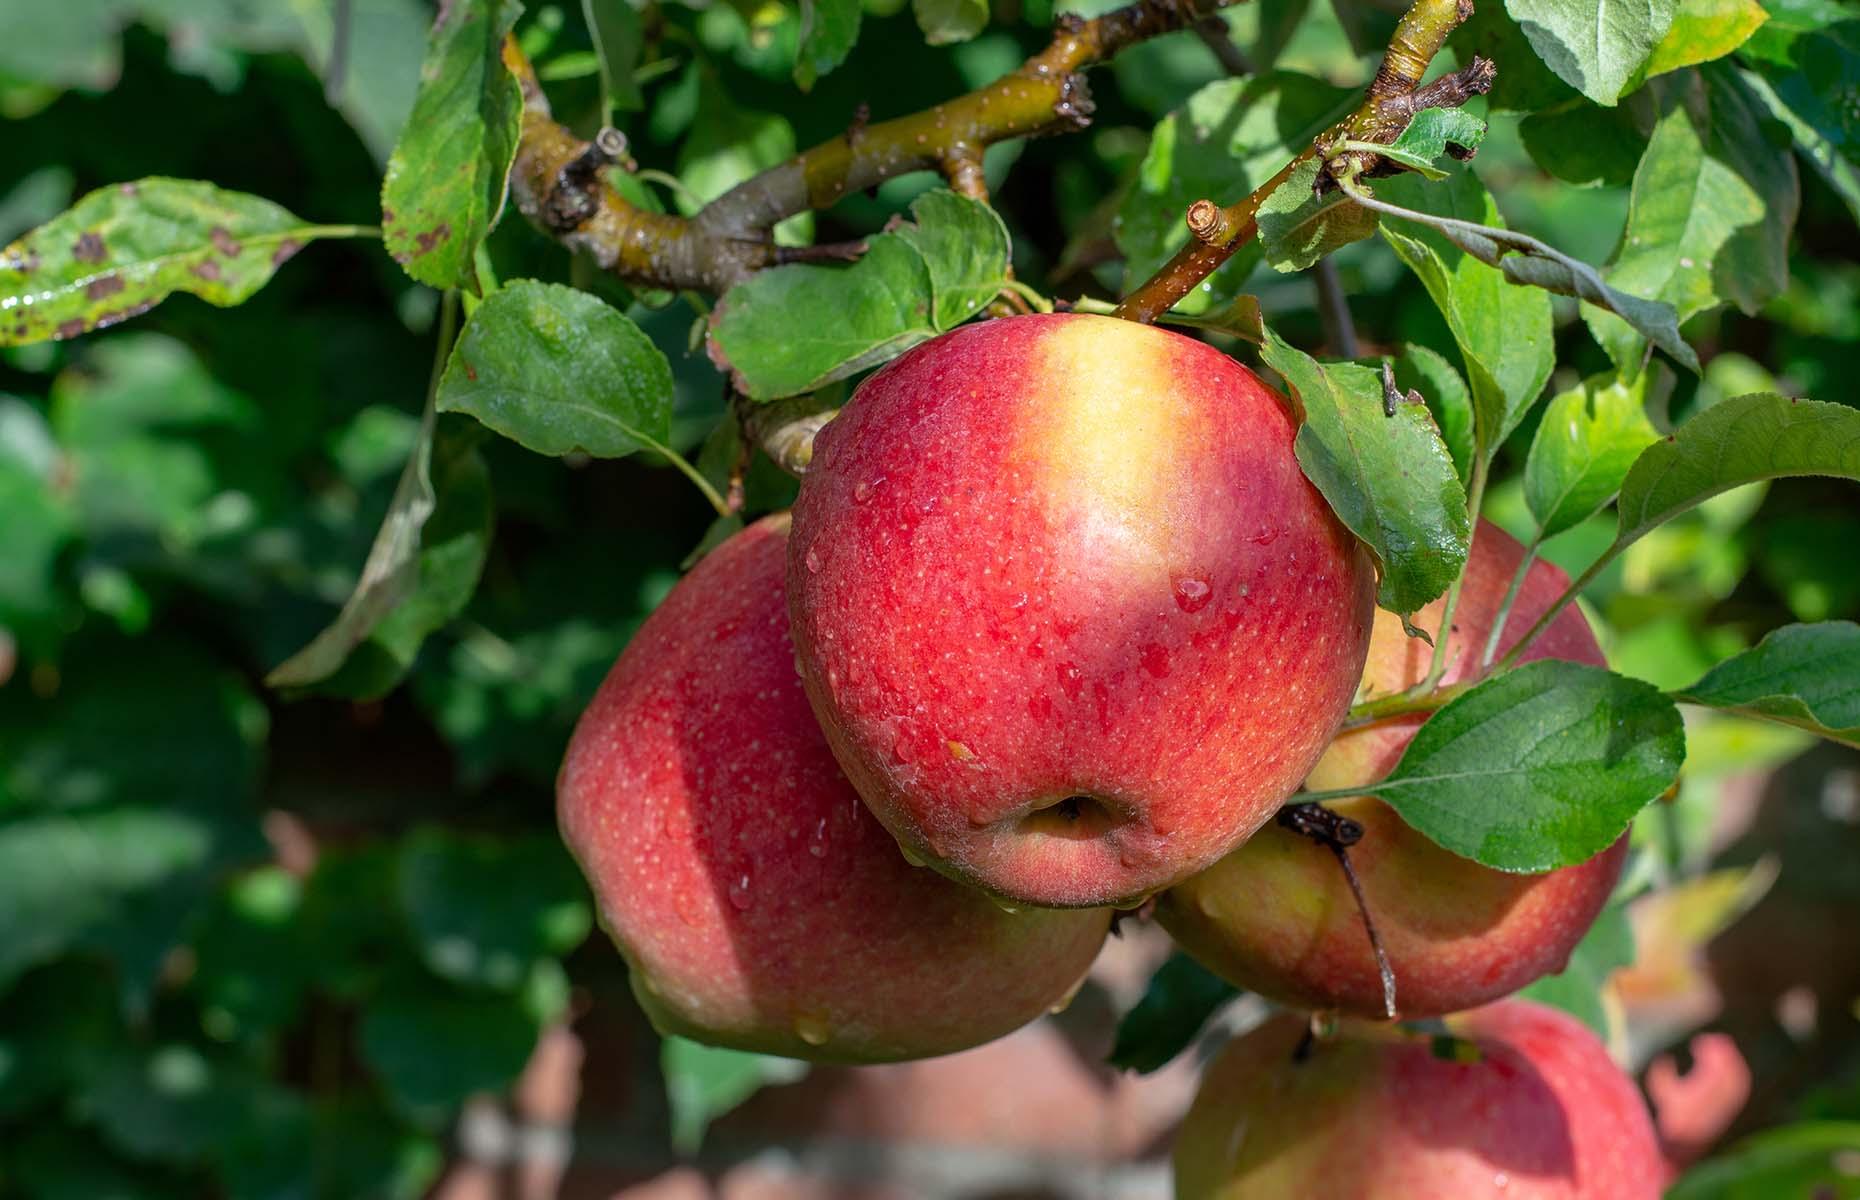 Braeburn apples (Image: barmalini/Shutterstock)